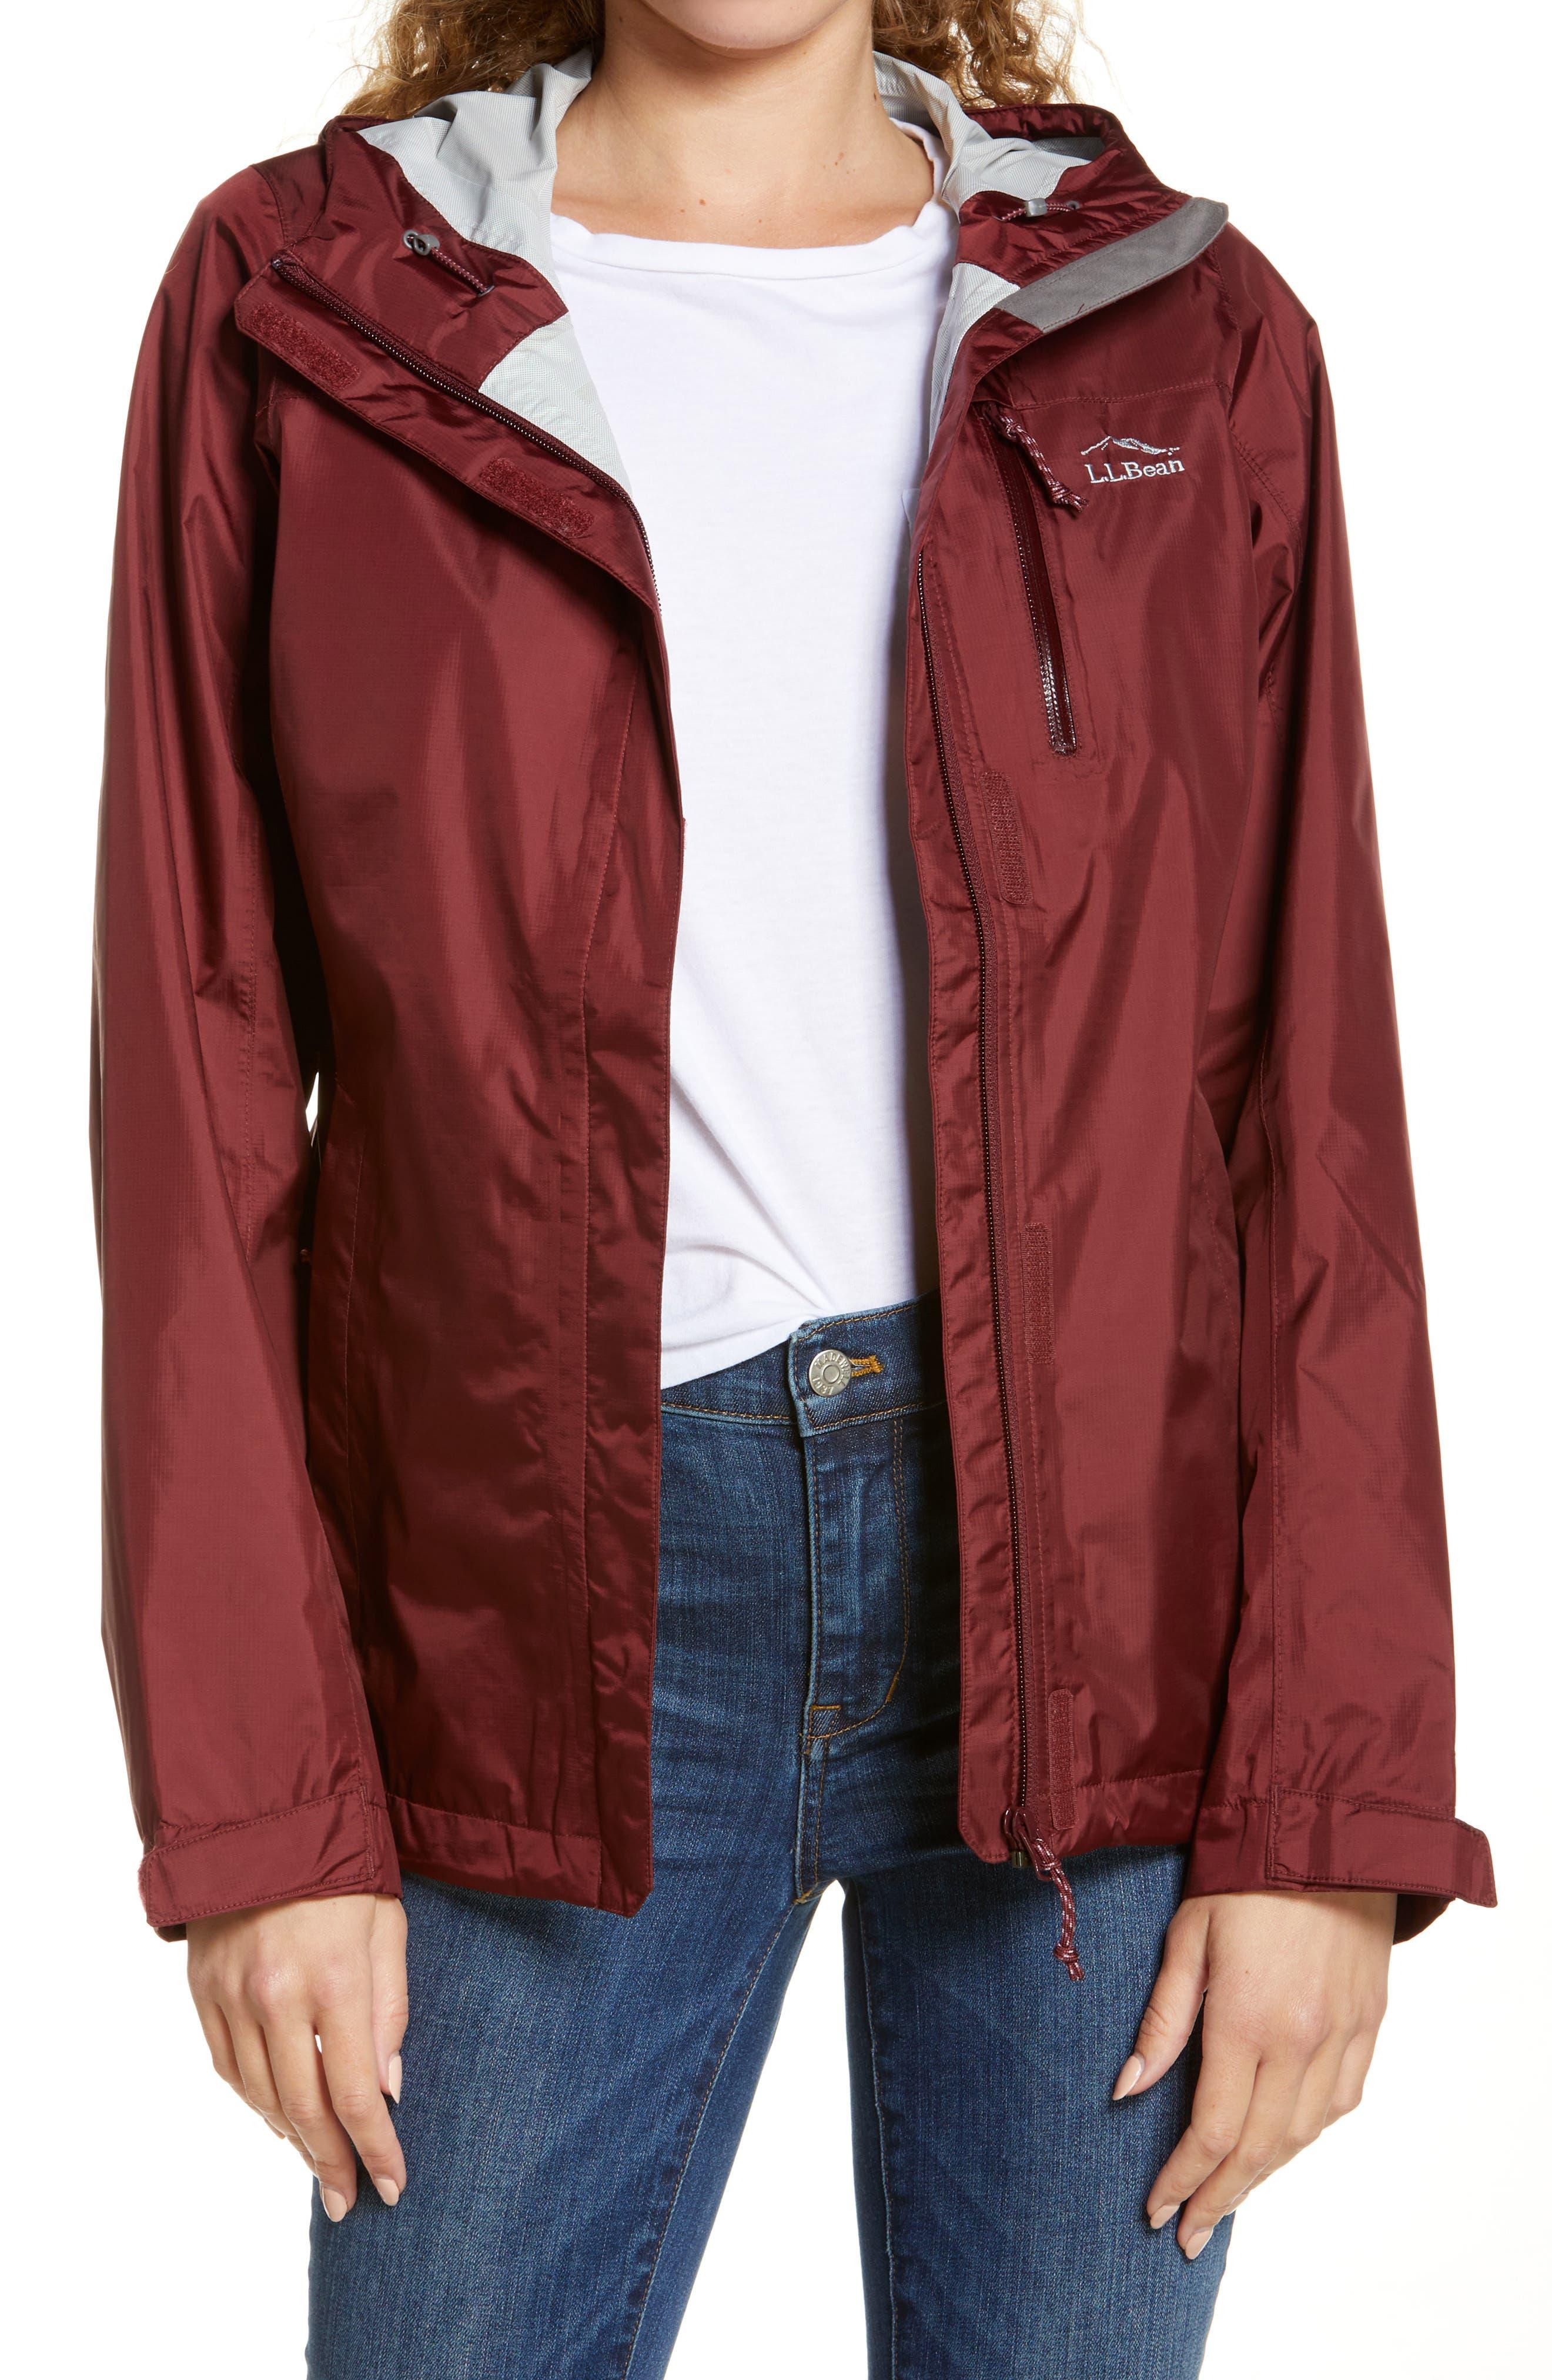 Women's L.l. Bean Trail Model Water Resistant Packable Rain Jacket